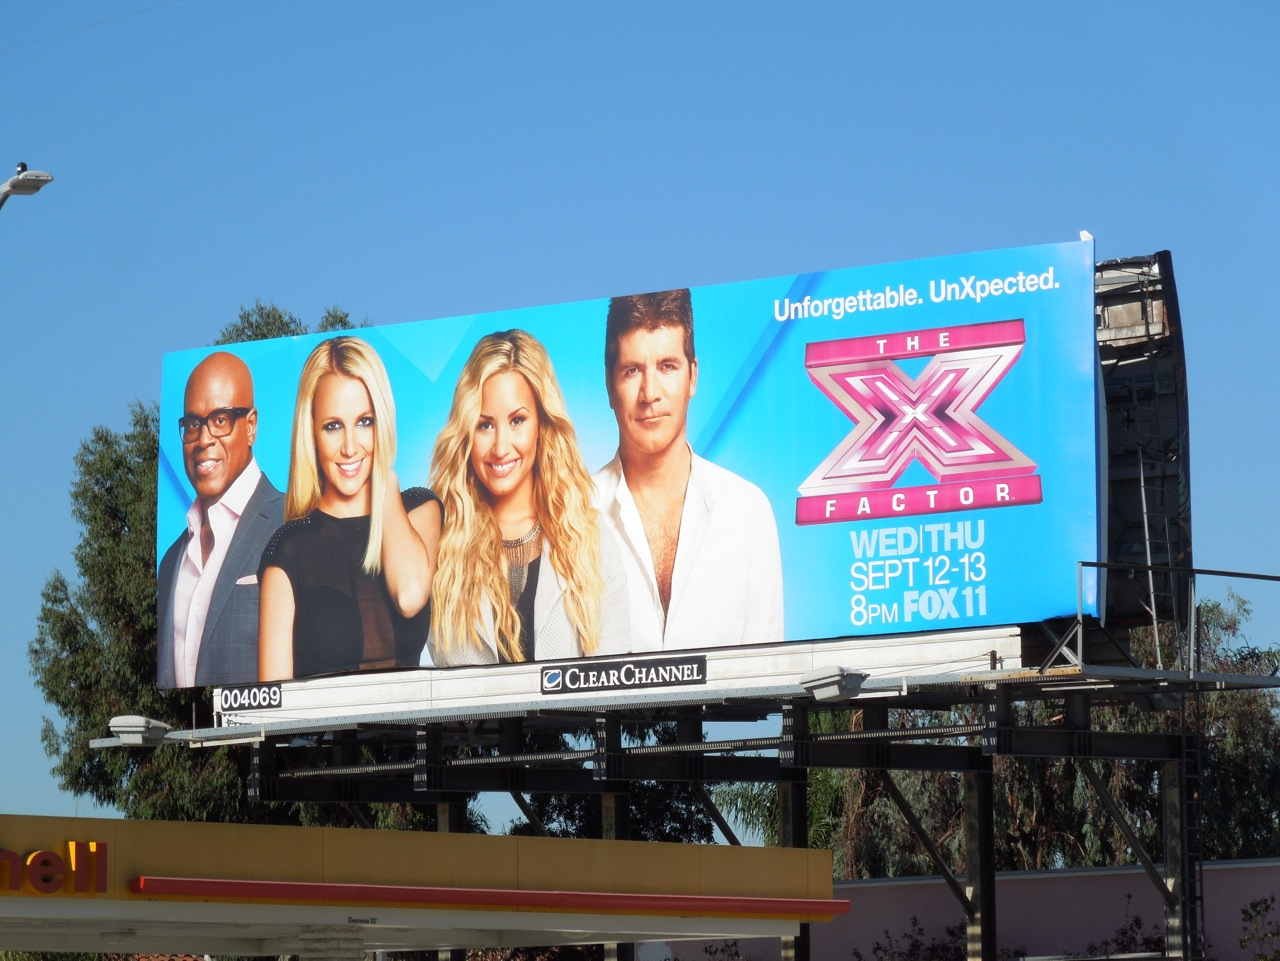 http://3.bp.blogspot.com/-byYPGvSMp-g/UEjtbA8DDMI/AAAAAAAAzeM/JLkXgVKNKbg/s1600/theXfactor+season2+billboard.jpg